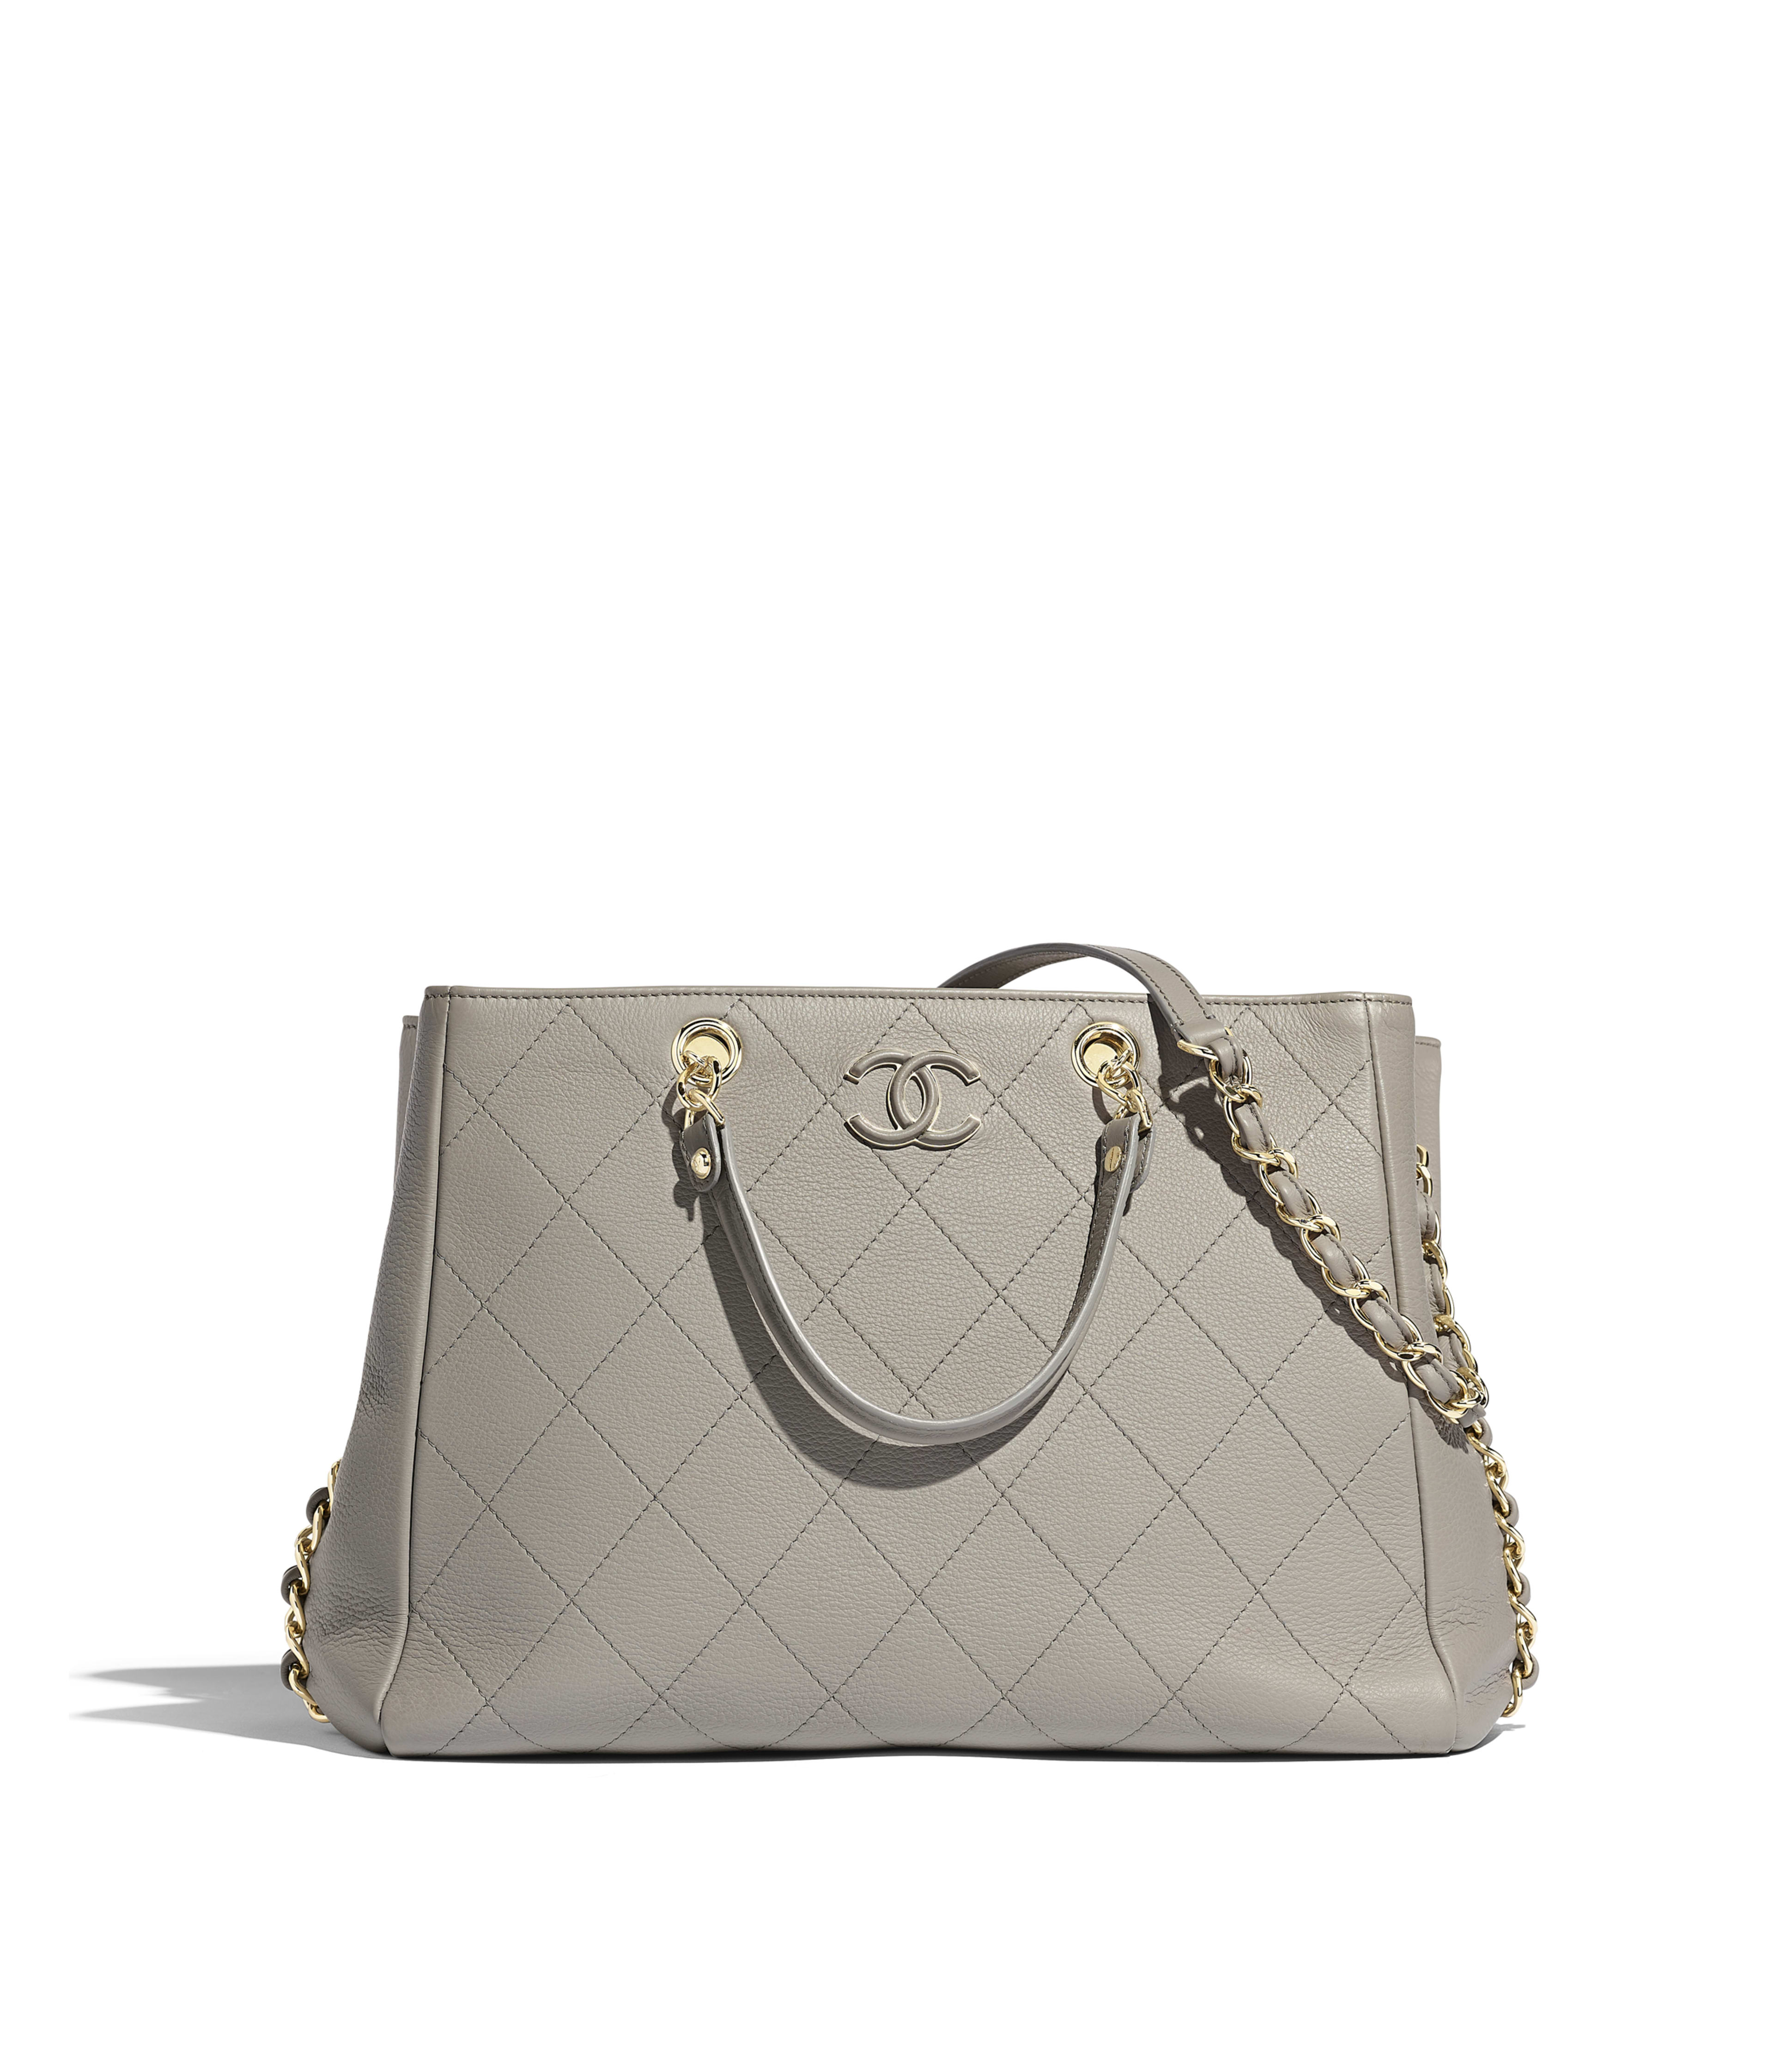 006049ee7b66 Handbags - Spring-Summer 2019 Pre-Collection